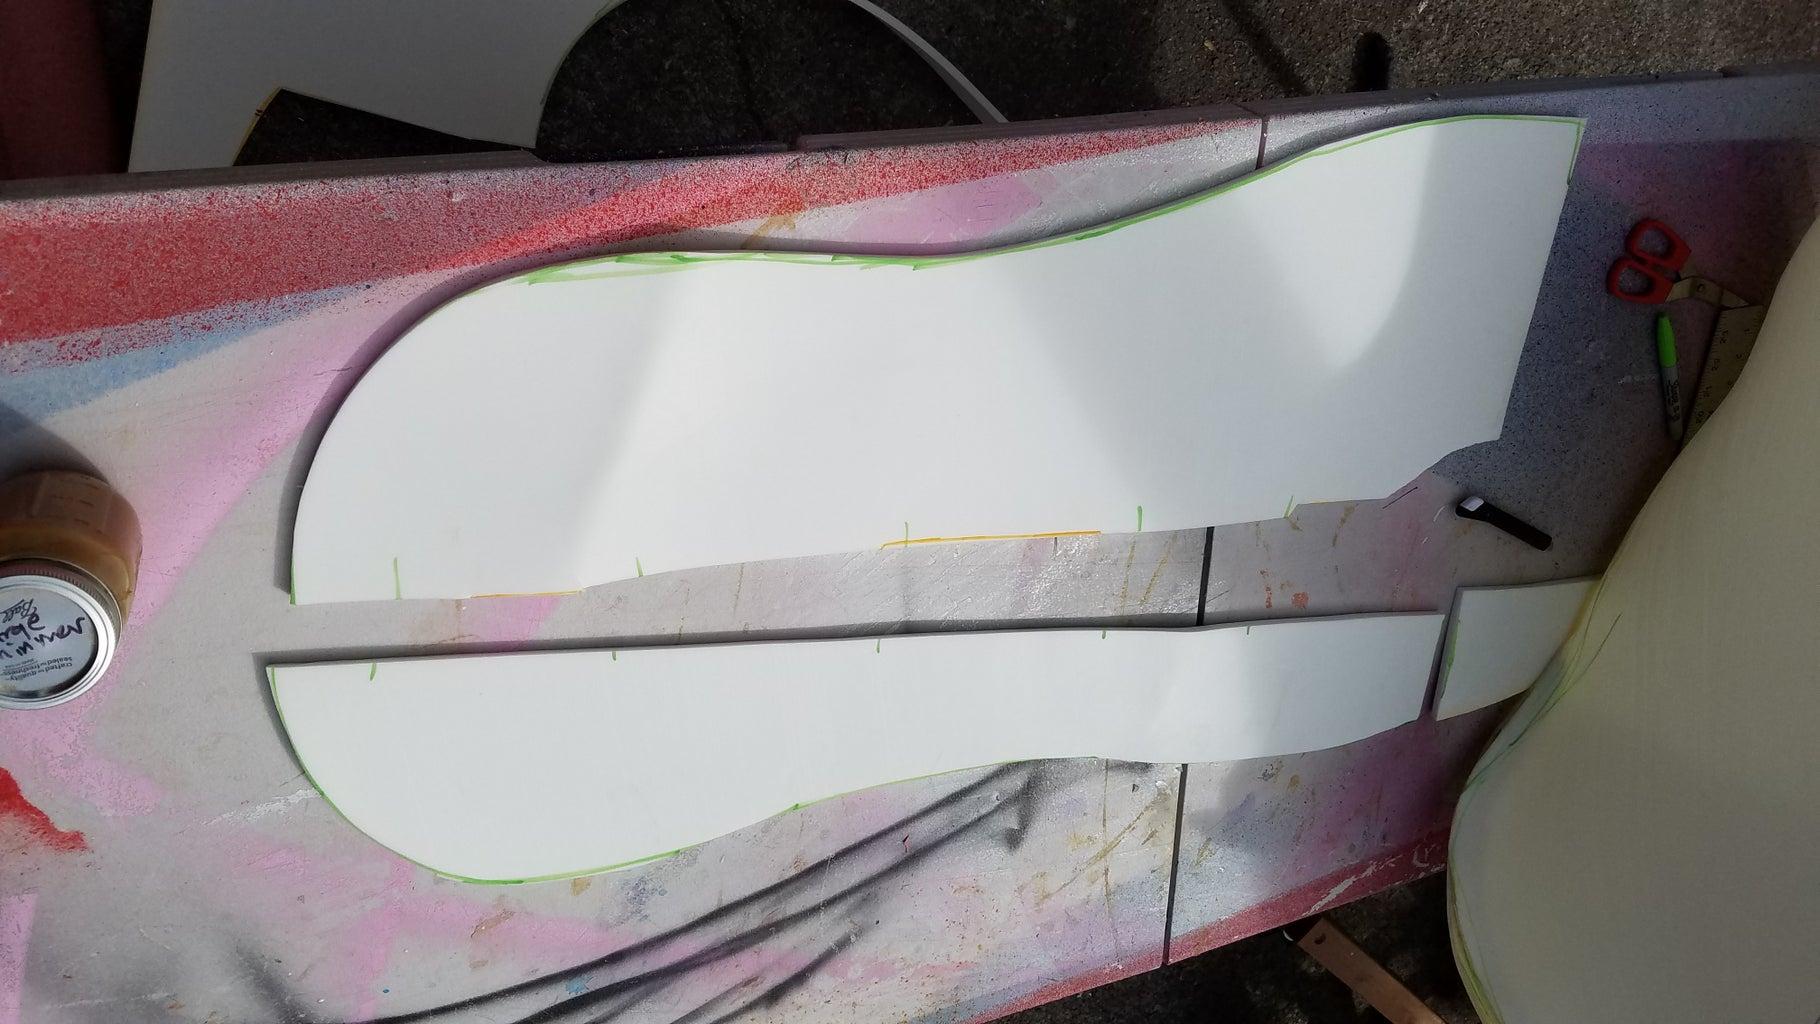 Foam Fabrication (project, Trace, Cut, Glue)